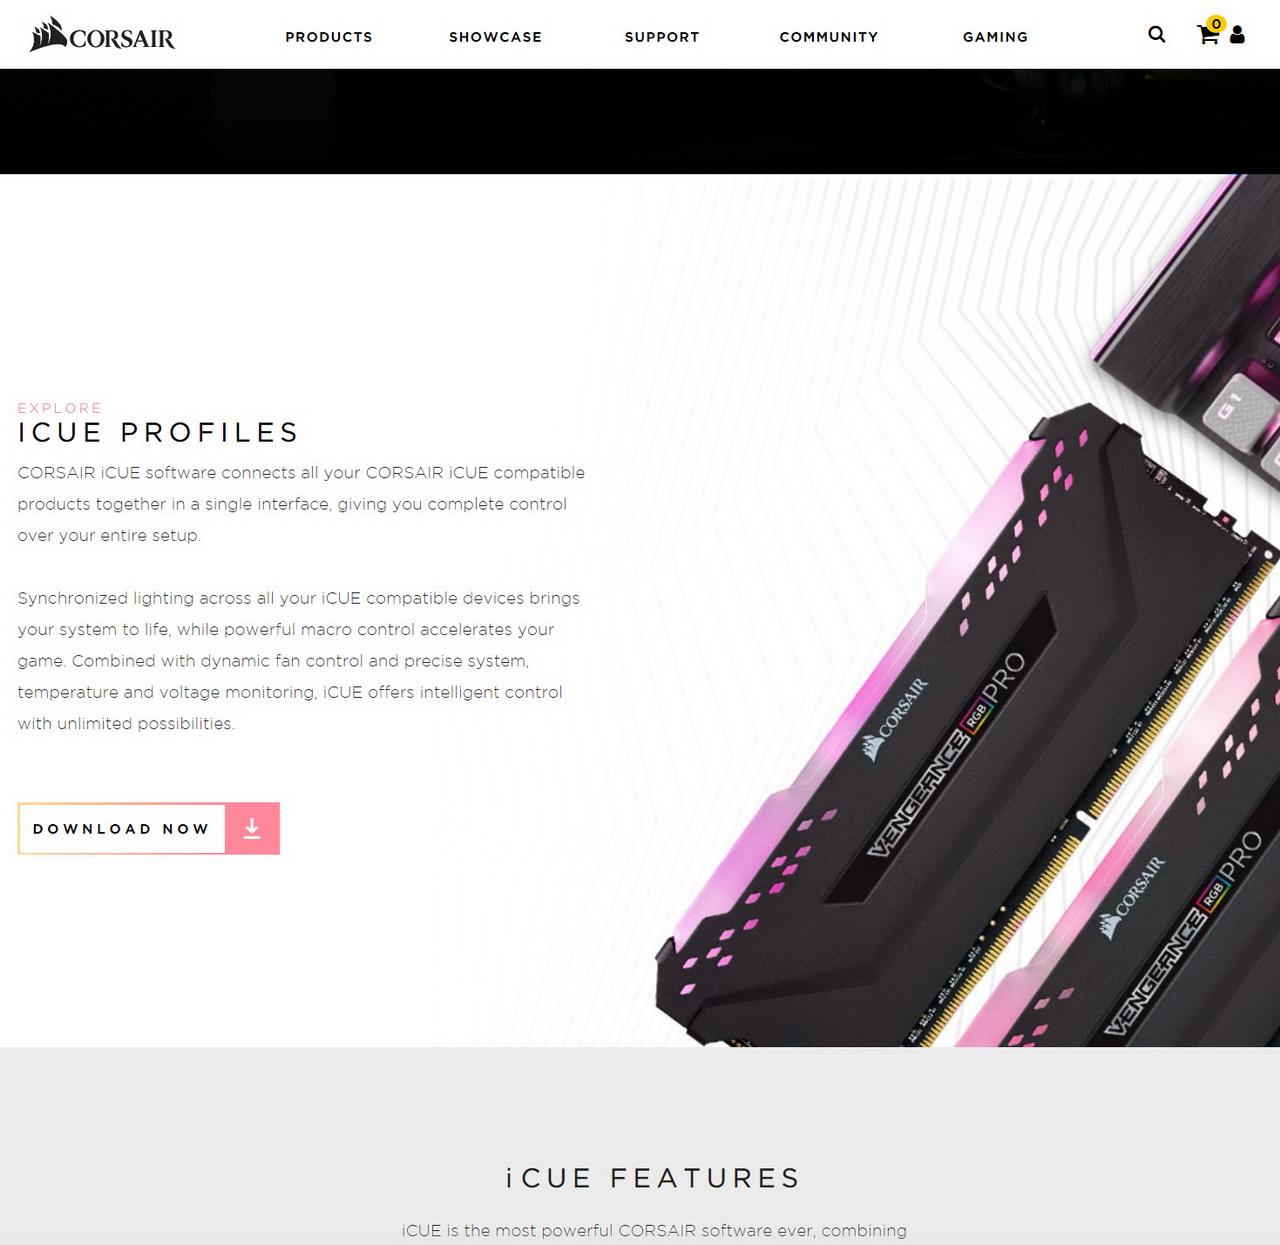 CORSAIR K70 RGB MK 2 Low Profile Mechanical Gaming Keyboard Review